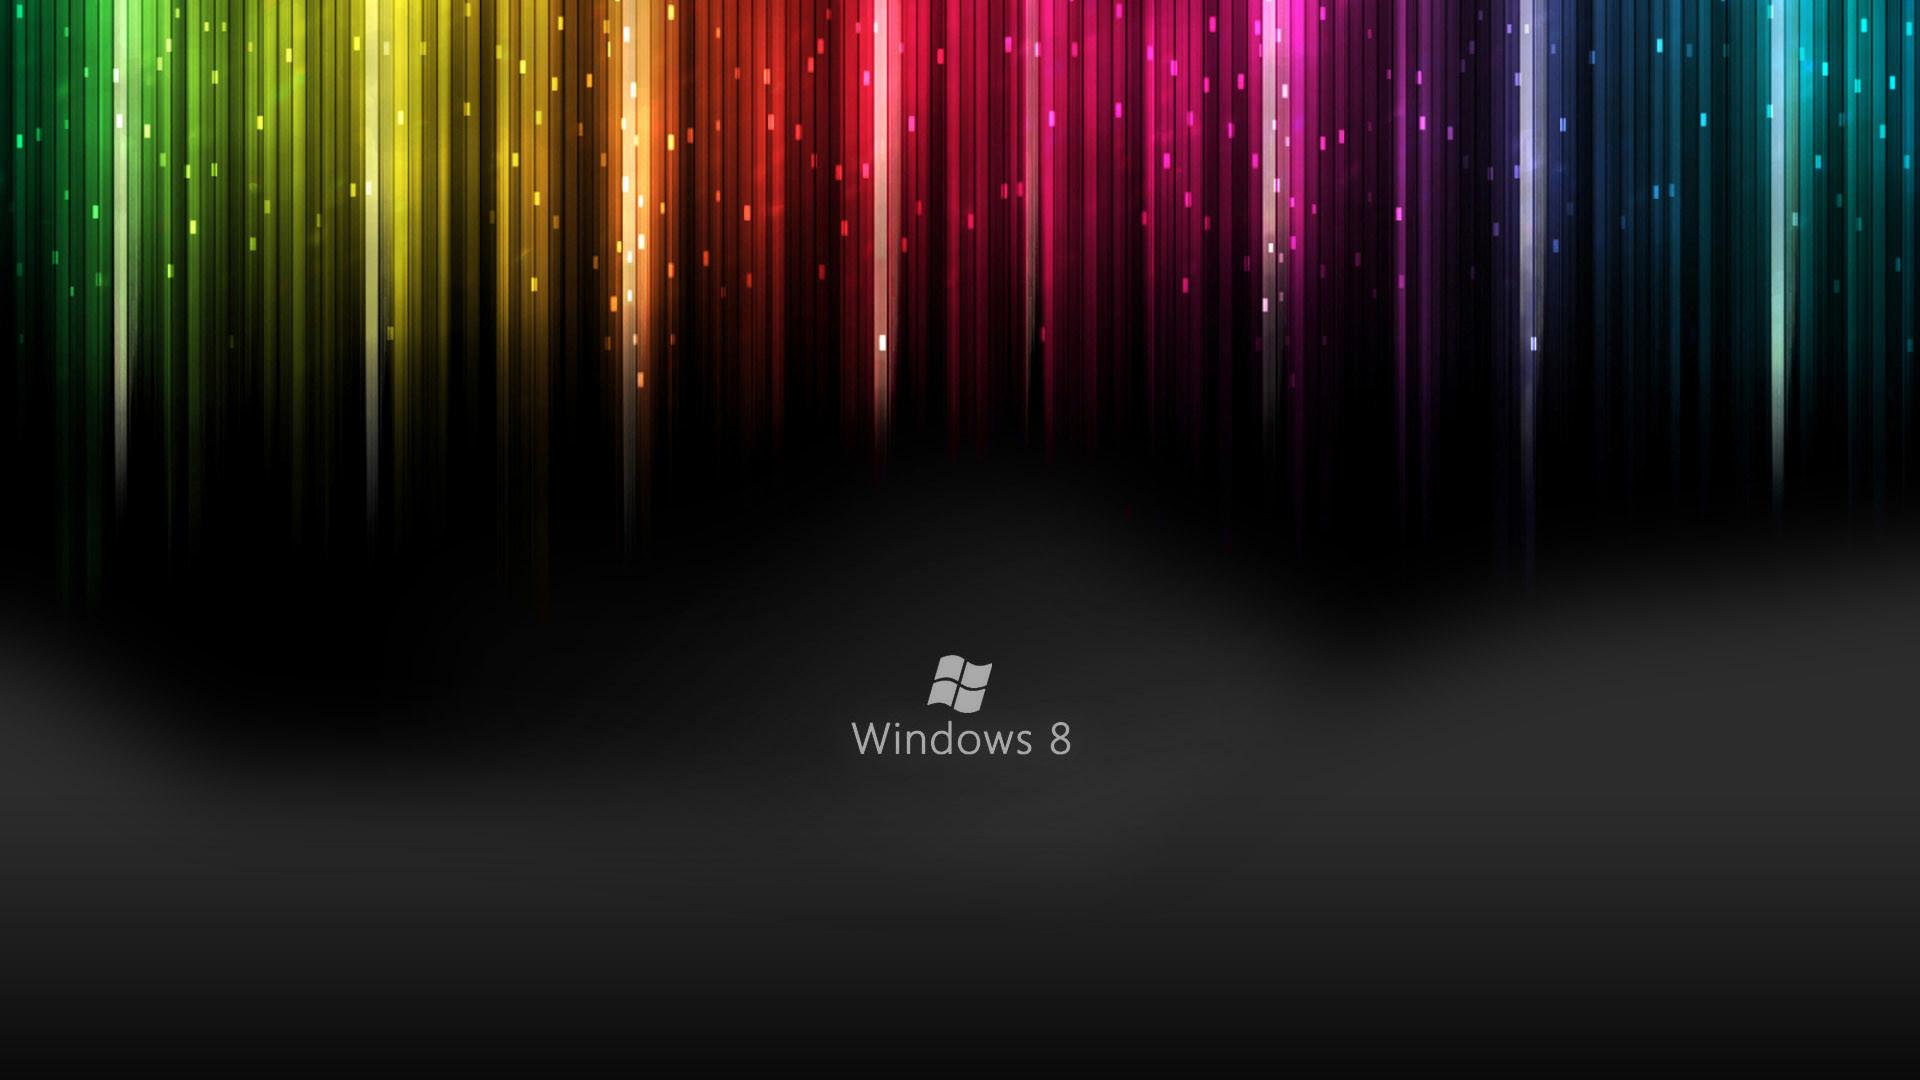 Aquarium Live Wallpaper For Windows Free Download : Free live wallpapers pc  windows wallpapersafari